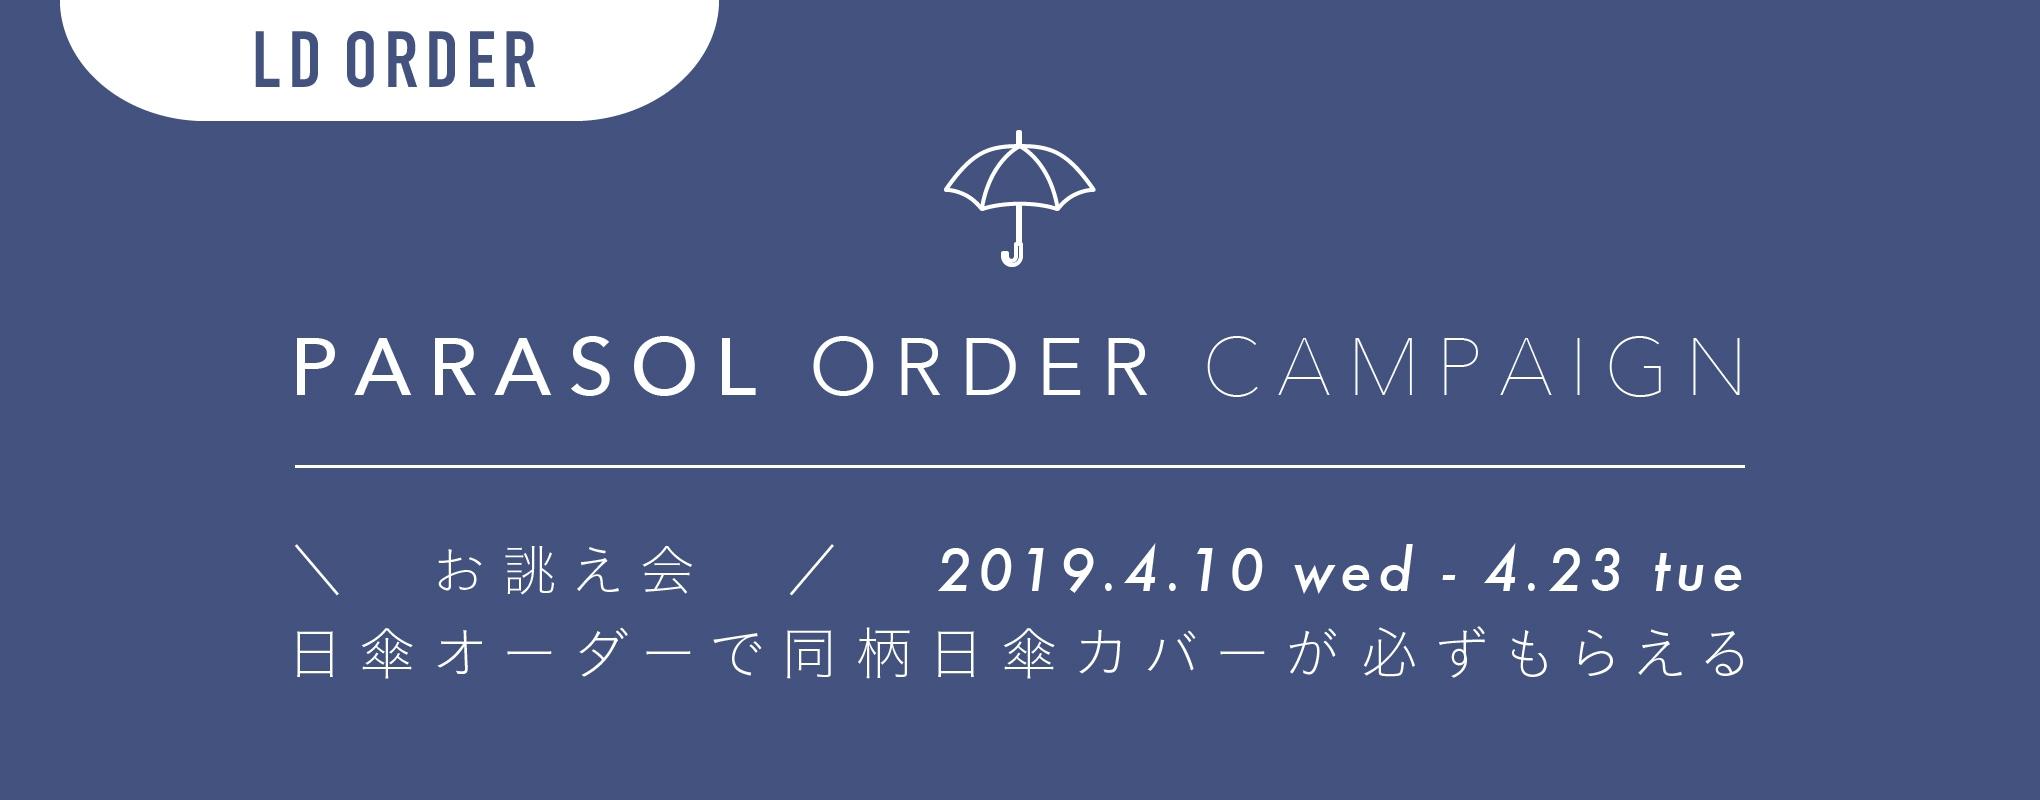 LD ORDER 日傘お誂え会